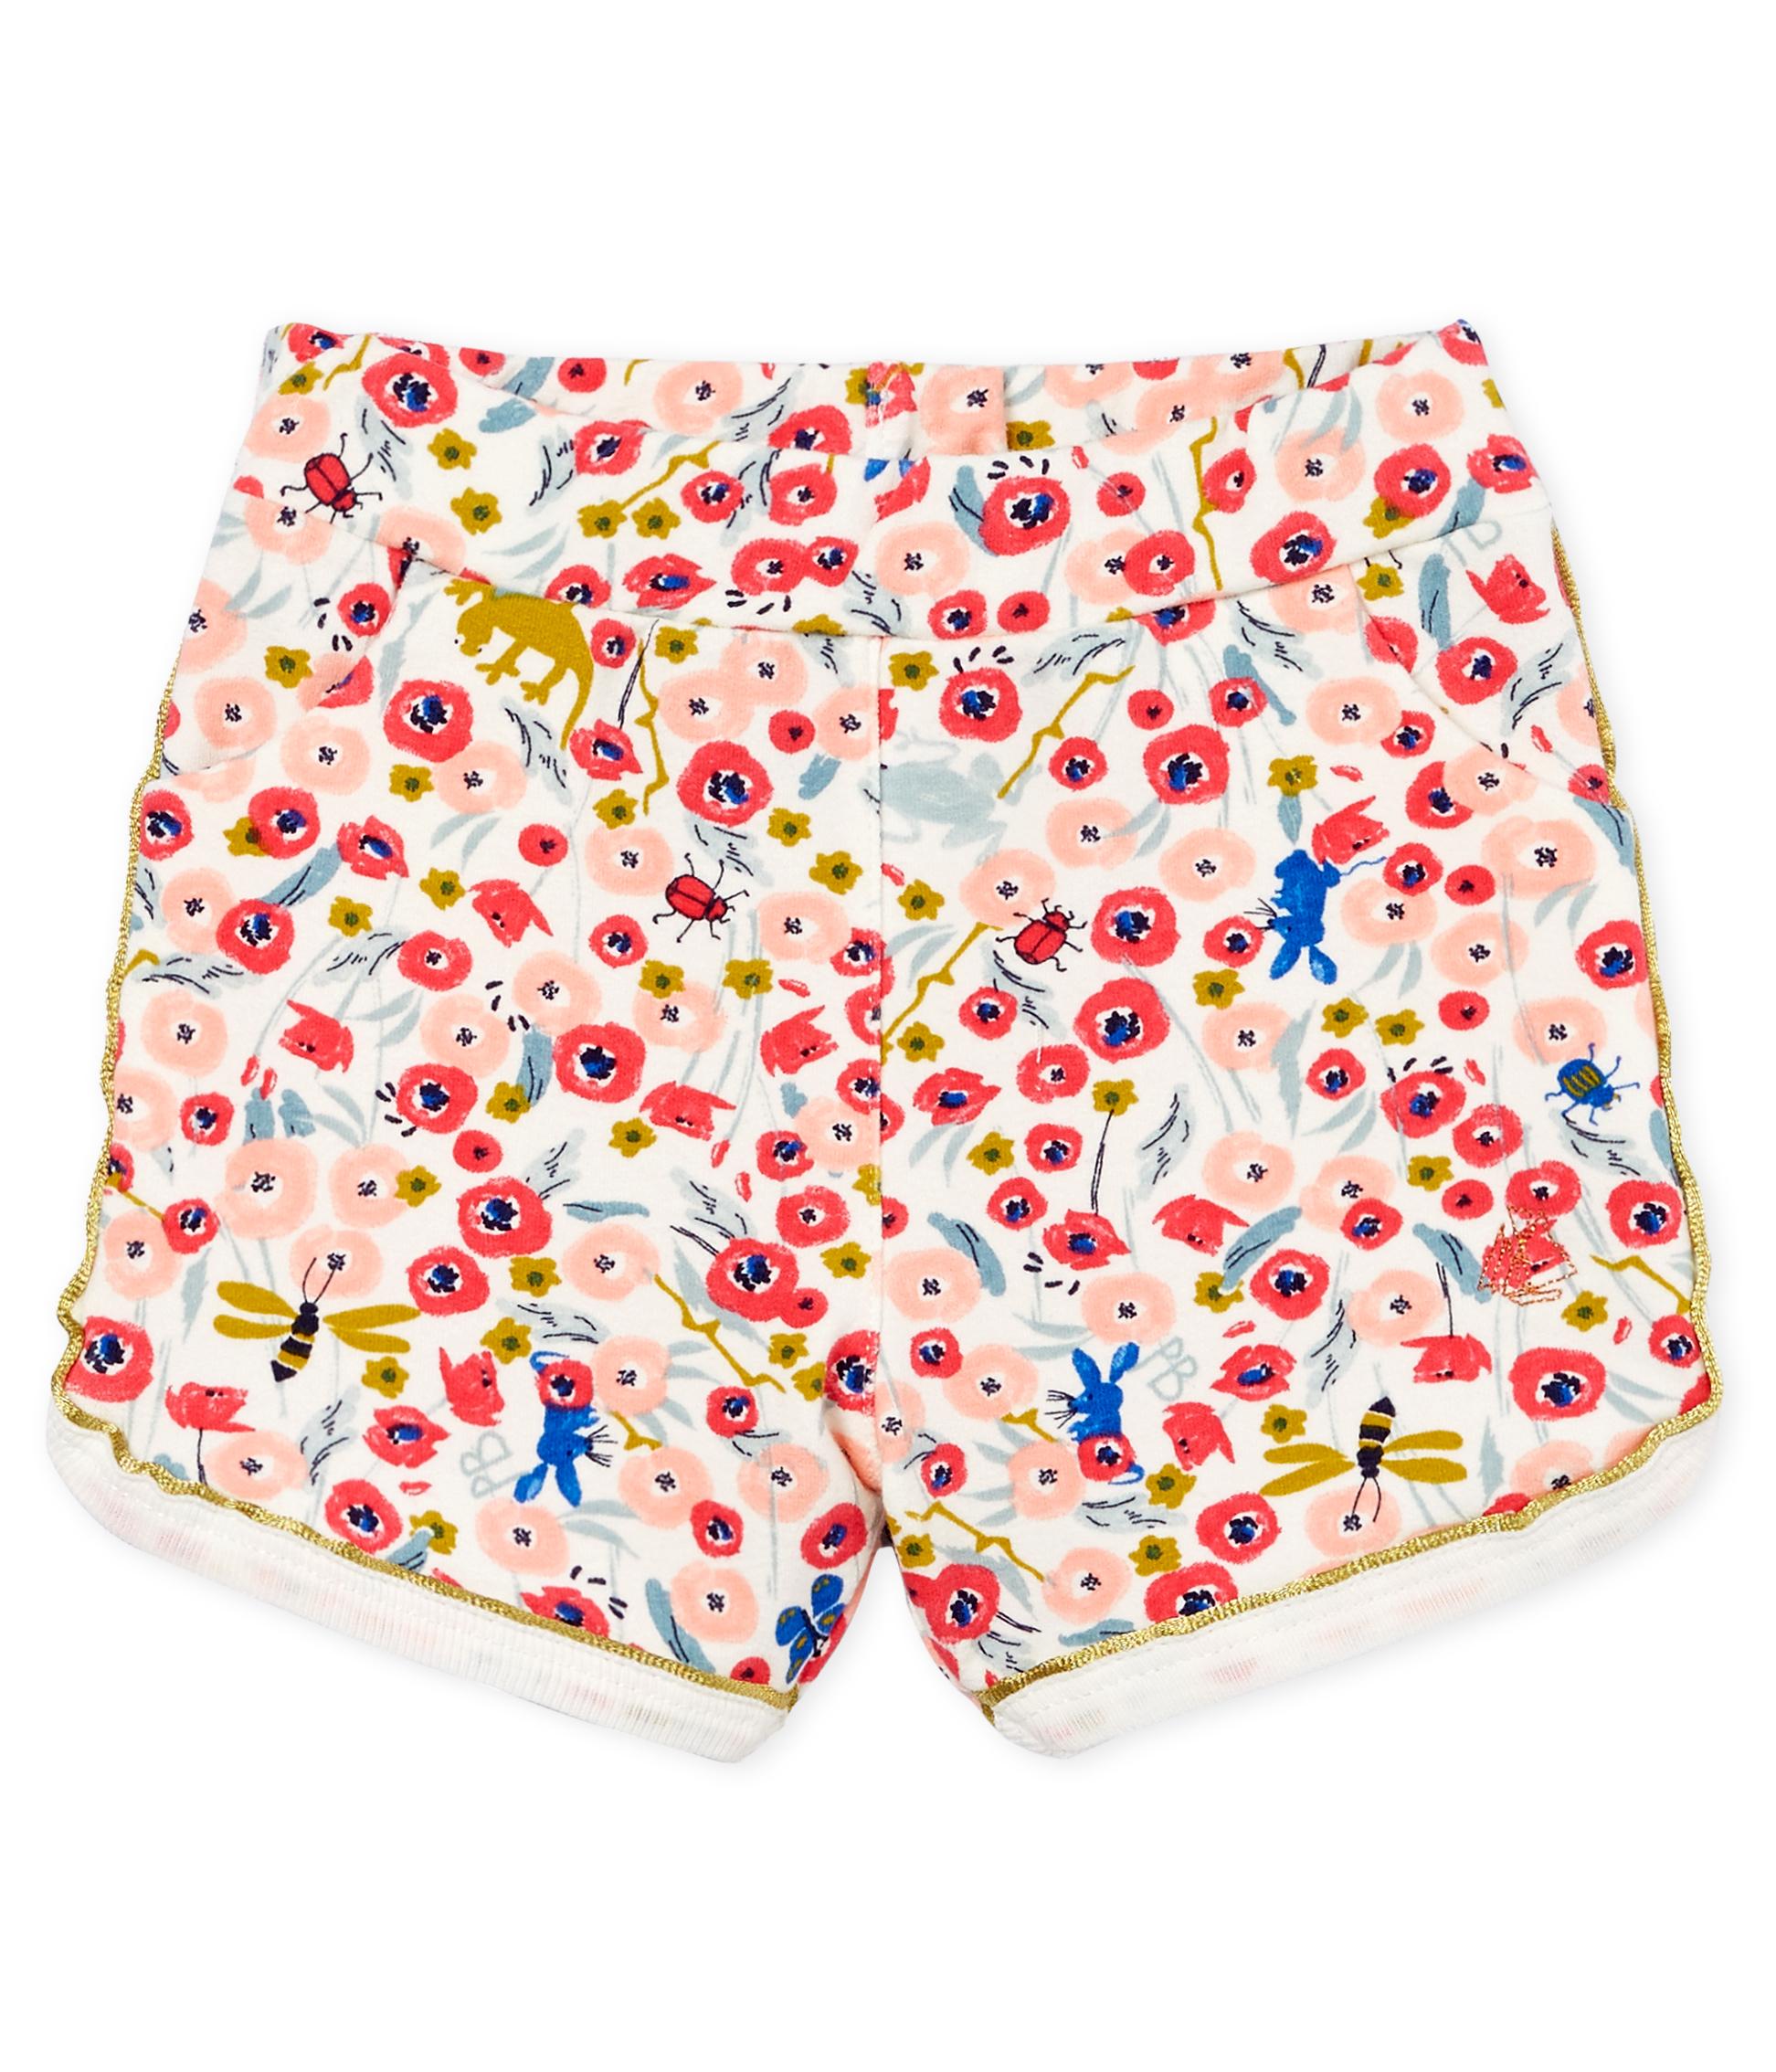 4e710cd3bdfd5 Petit Bateau Baby Boys Printed Swim Shorts 6 Months Clothing Trunks